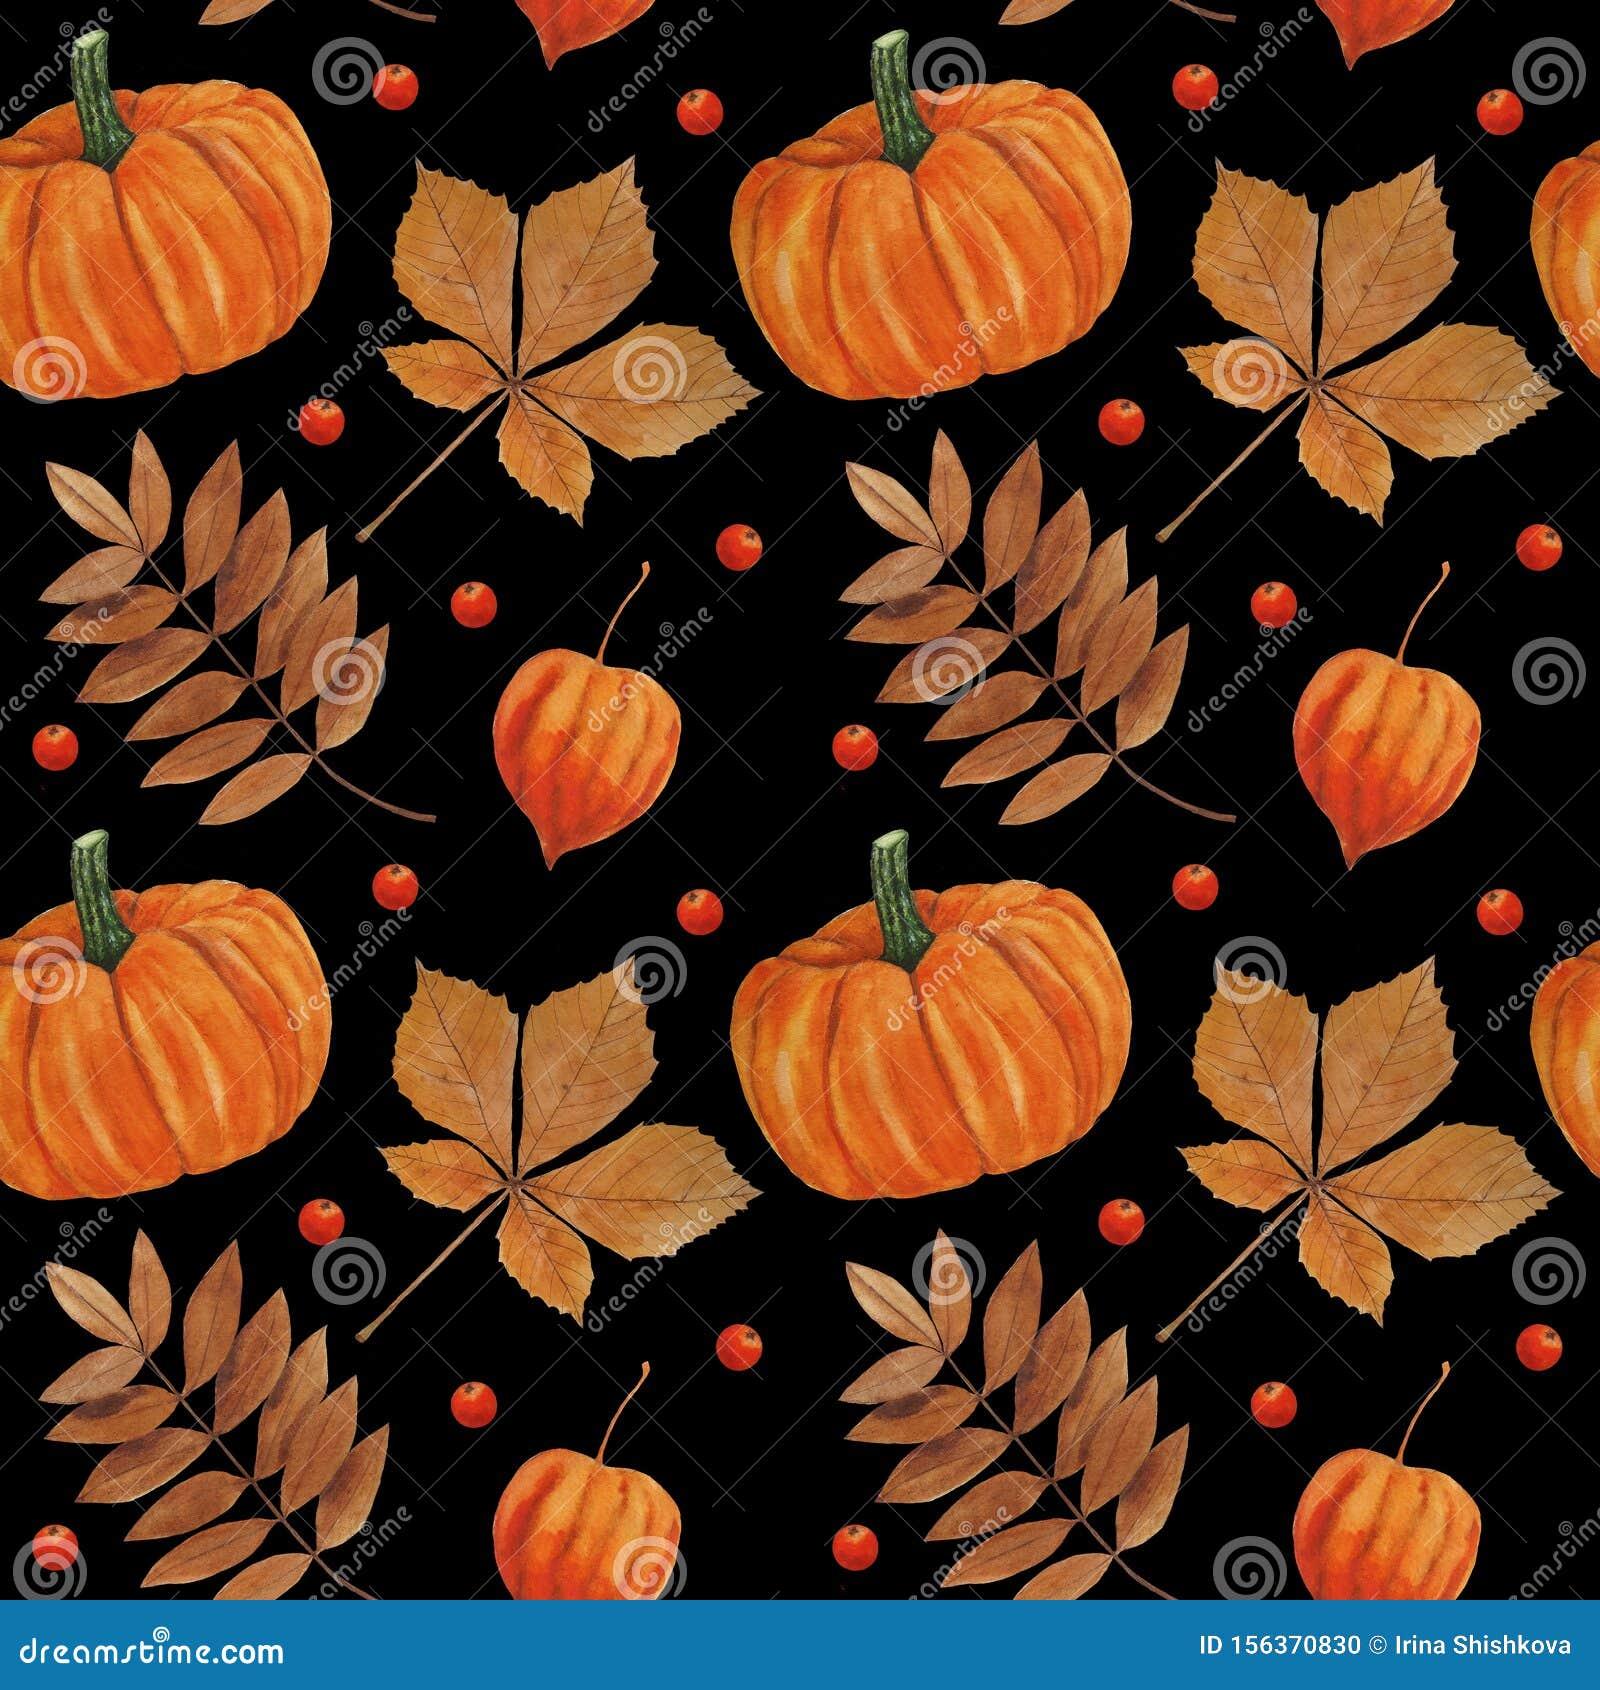 Pattern Autumn Leaves And Pumpkin Illustrations Watercolor Botanical Digital Paper Textile Autumn Autumn Decor Wallpaper Scrapbook Stock Illustration Illustration Of Abstract Brown 156370830